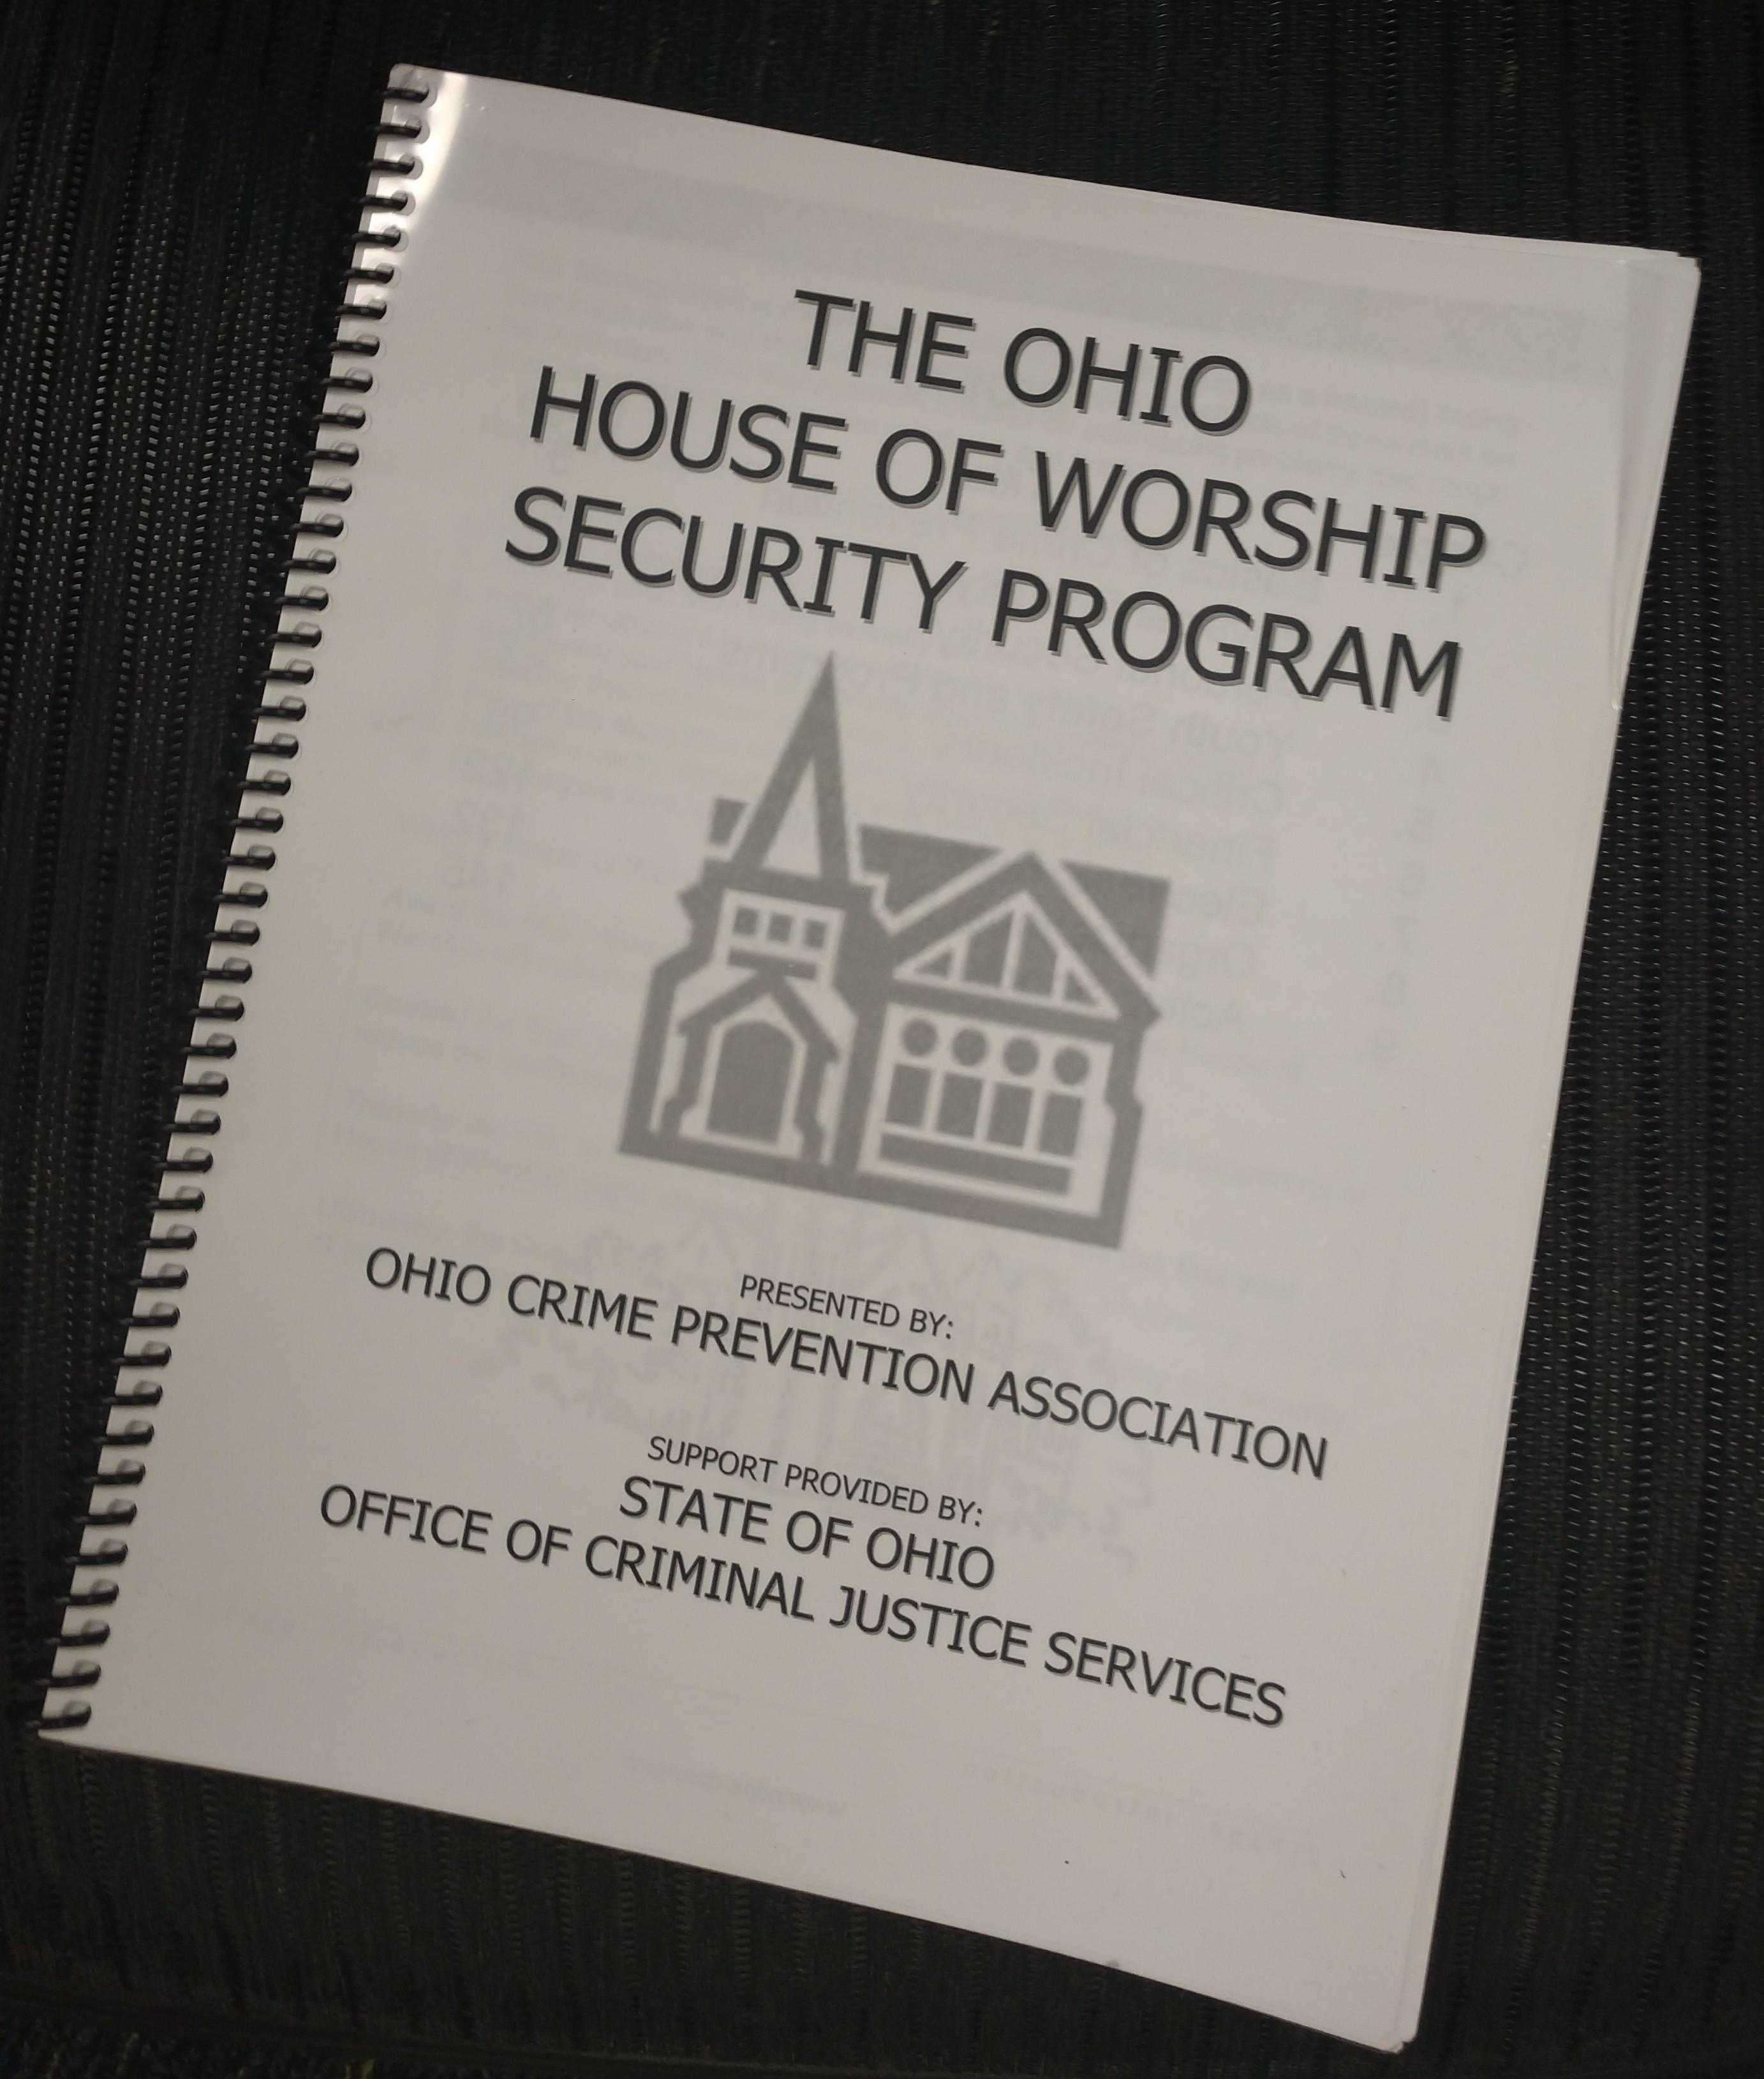 house of worship training handbook.jpg